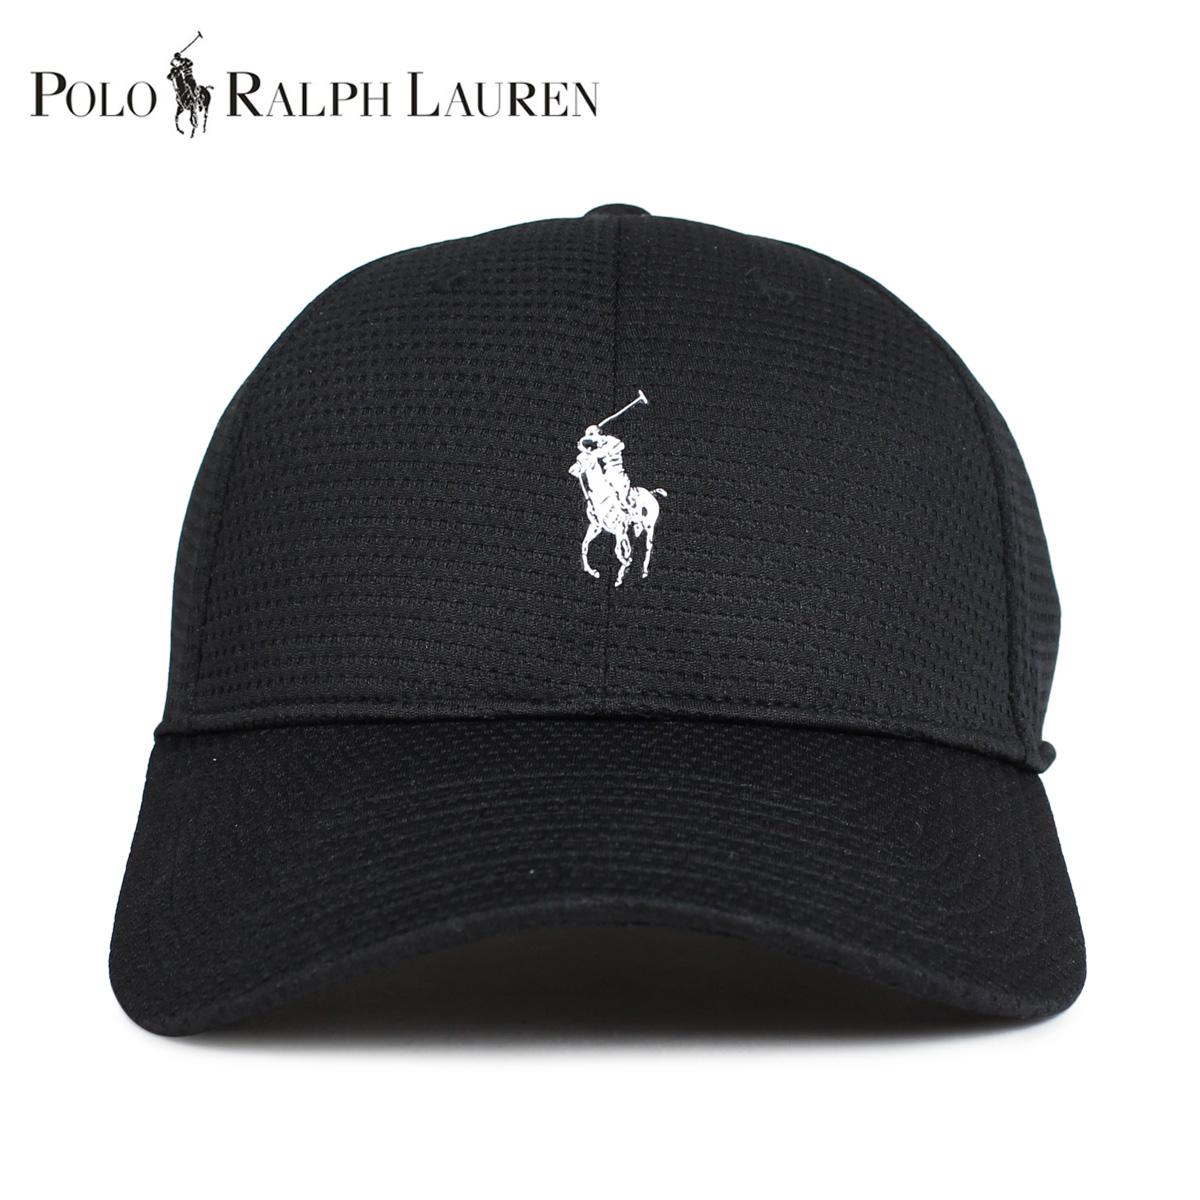 lowest price ff3bb 5f728 POLO RALPH LAUREN polo Ralph Lauren cap hat baseball cap men mesh black  black 710706148